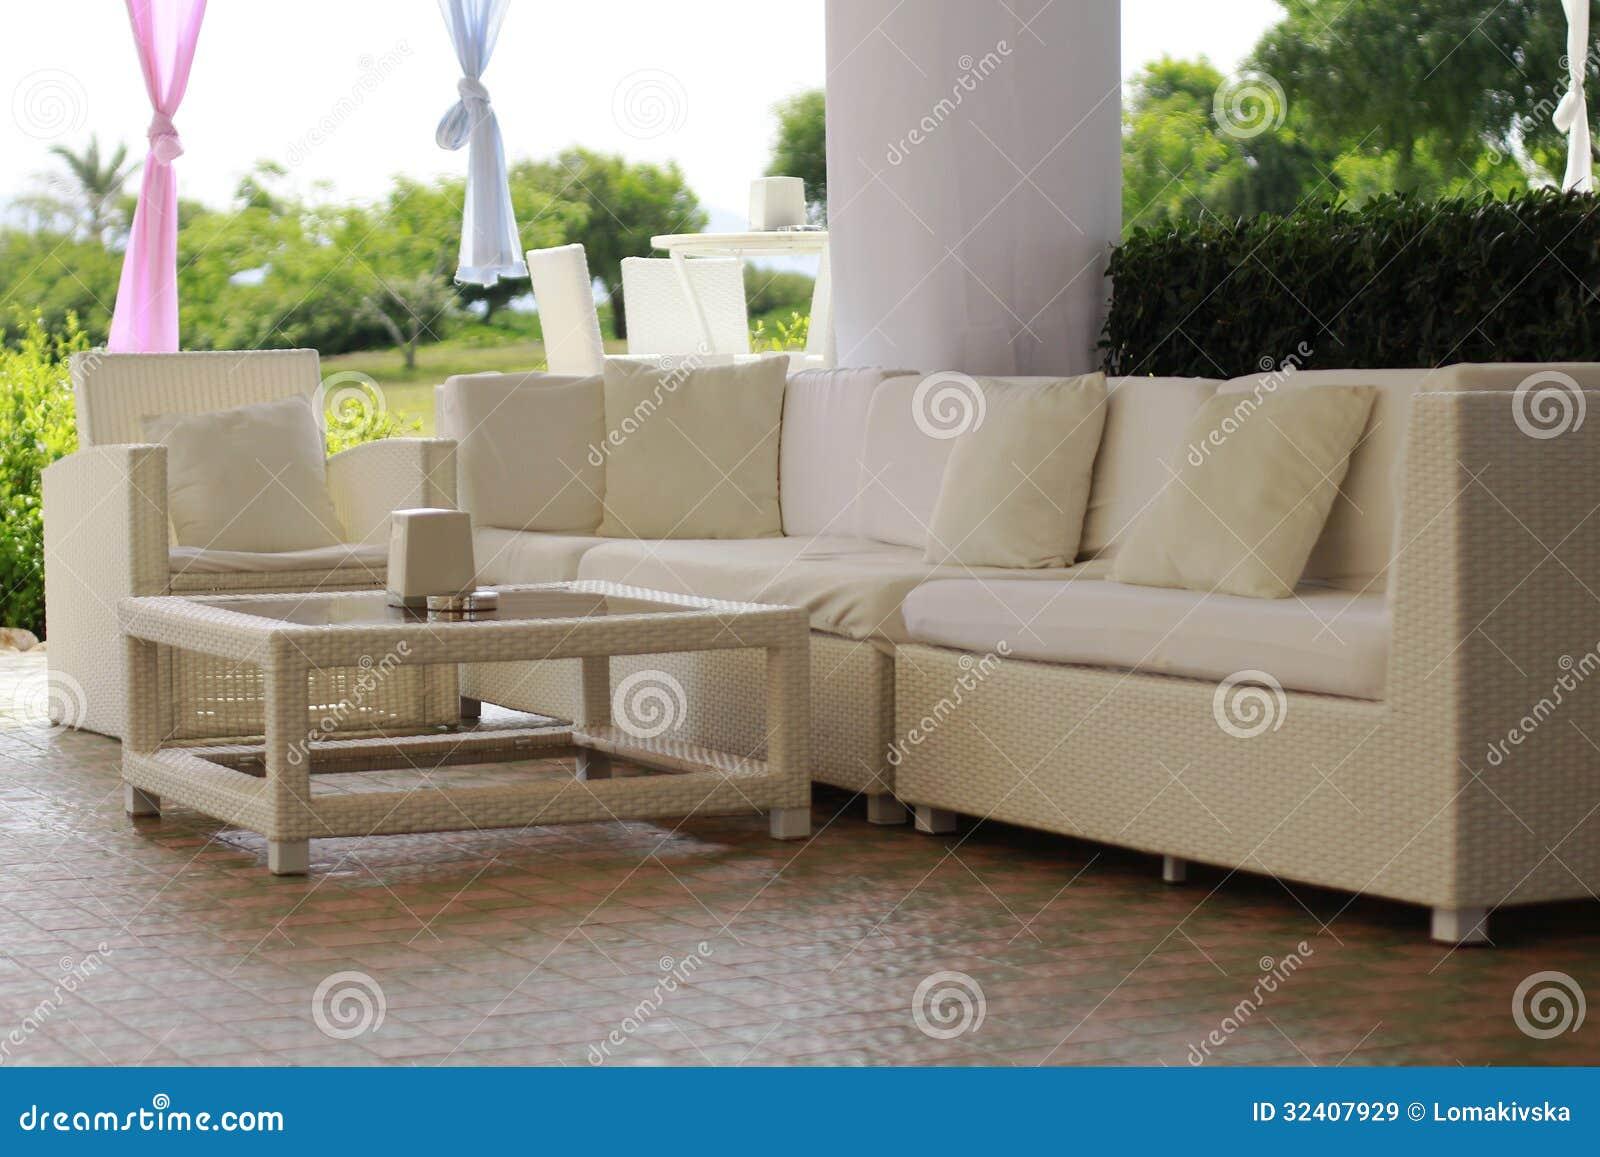 Rieten meubilair